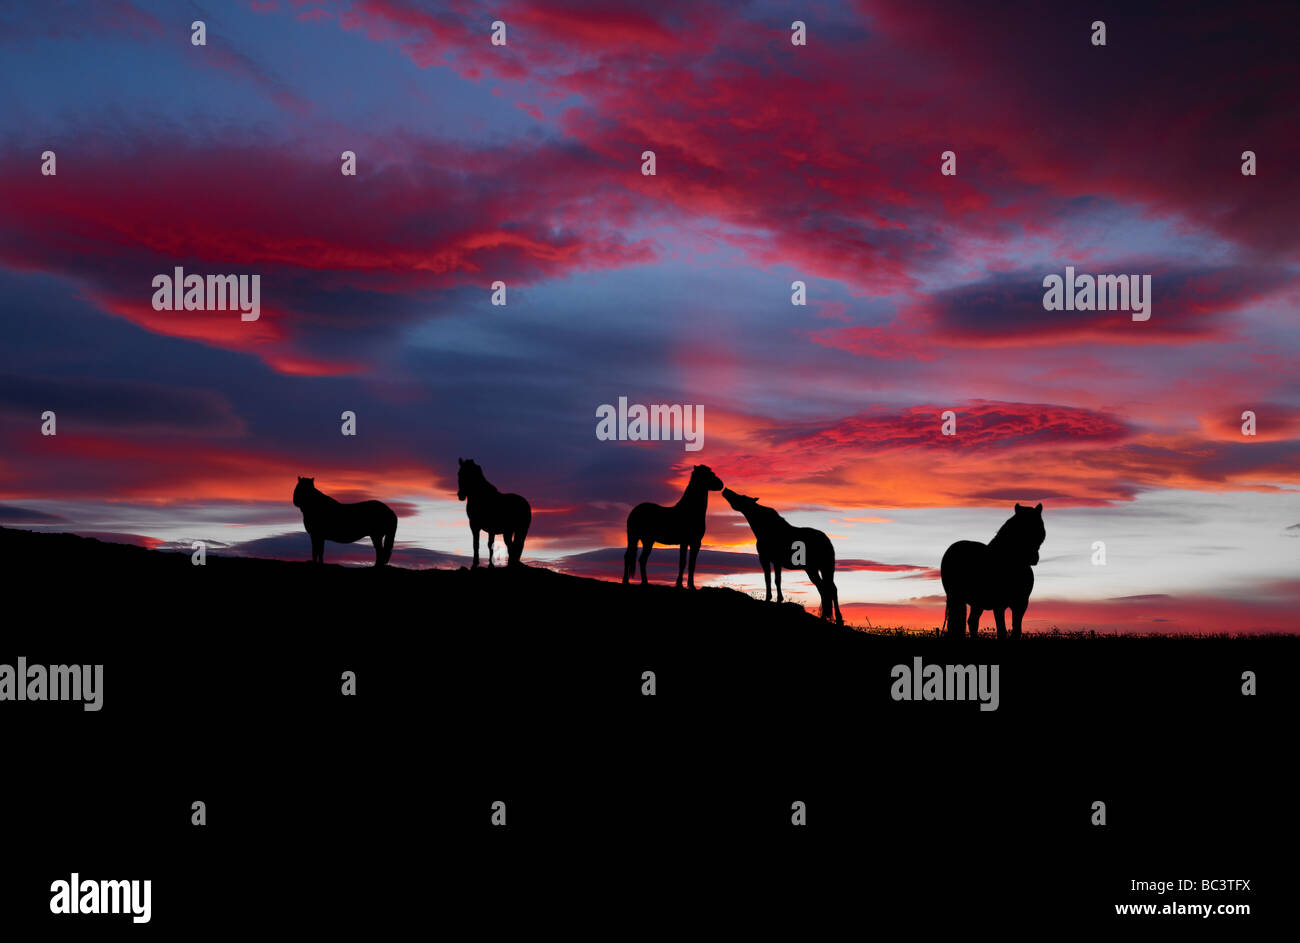 Silhouette of Icelandic horses at sunset, Iceland - Stock Image